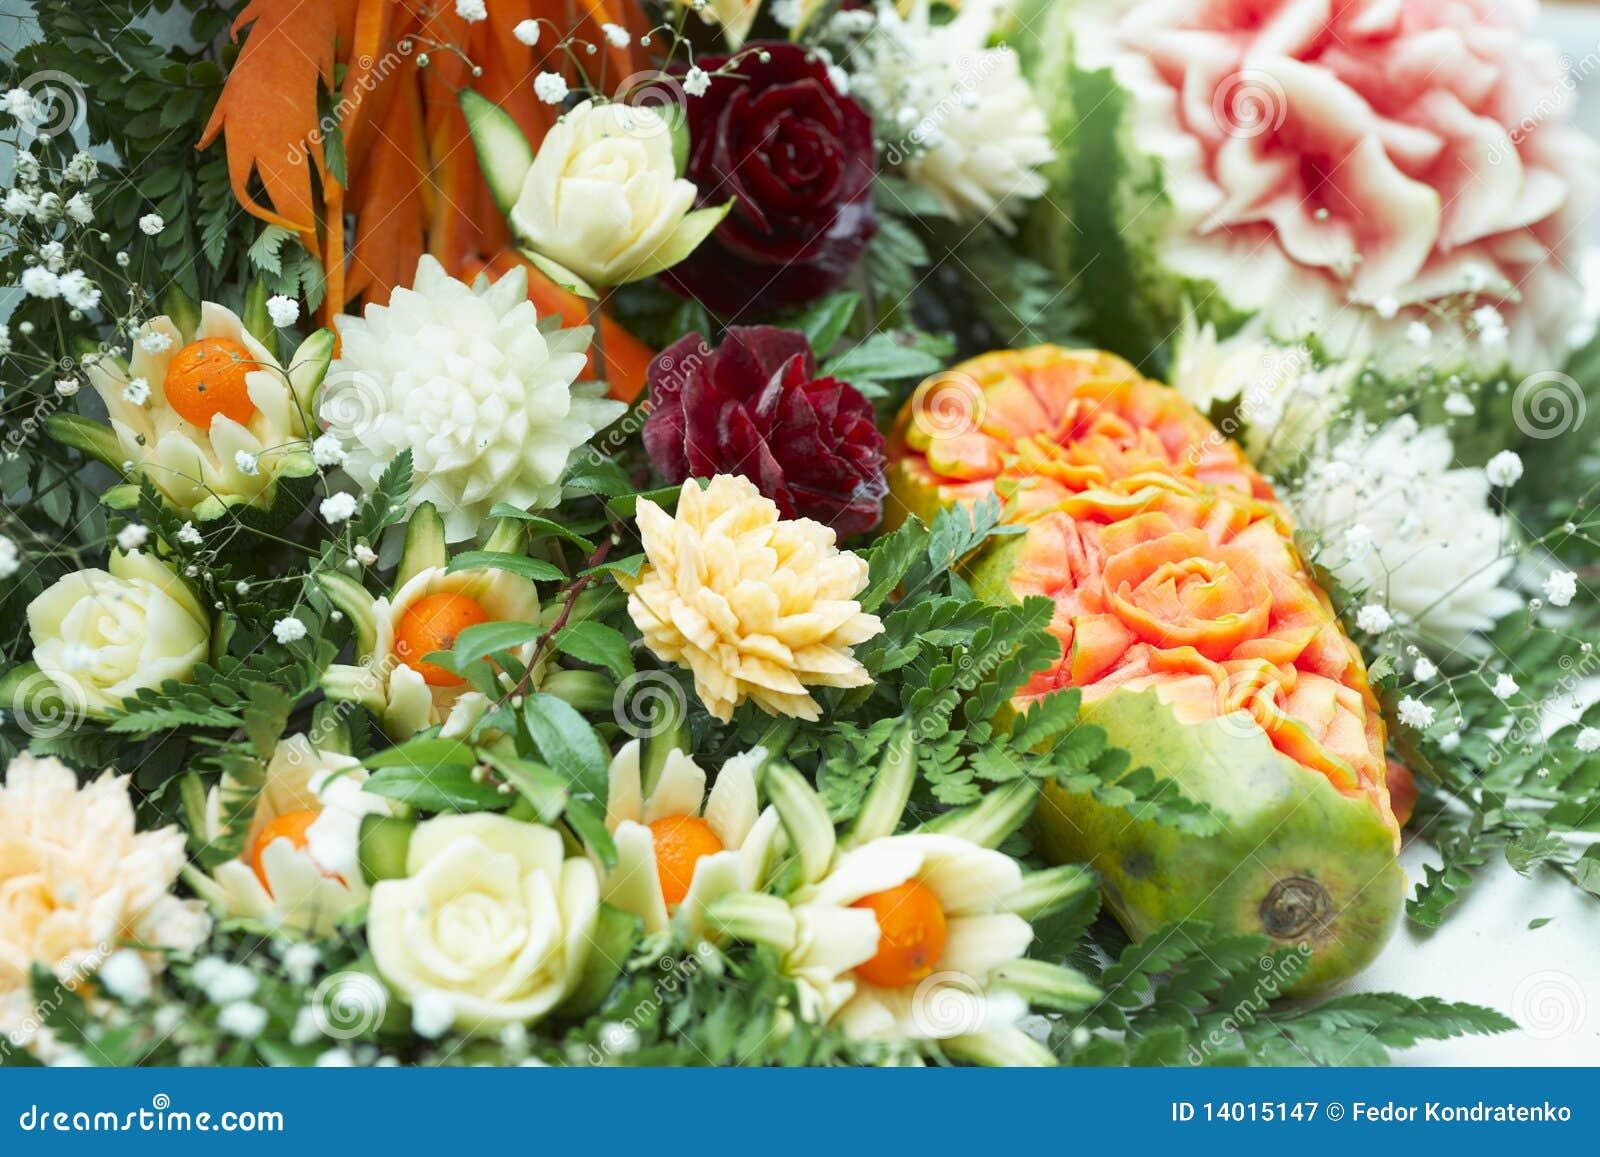 Elegant food carving stock image of flora petal